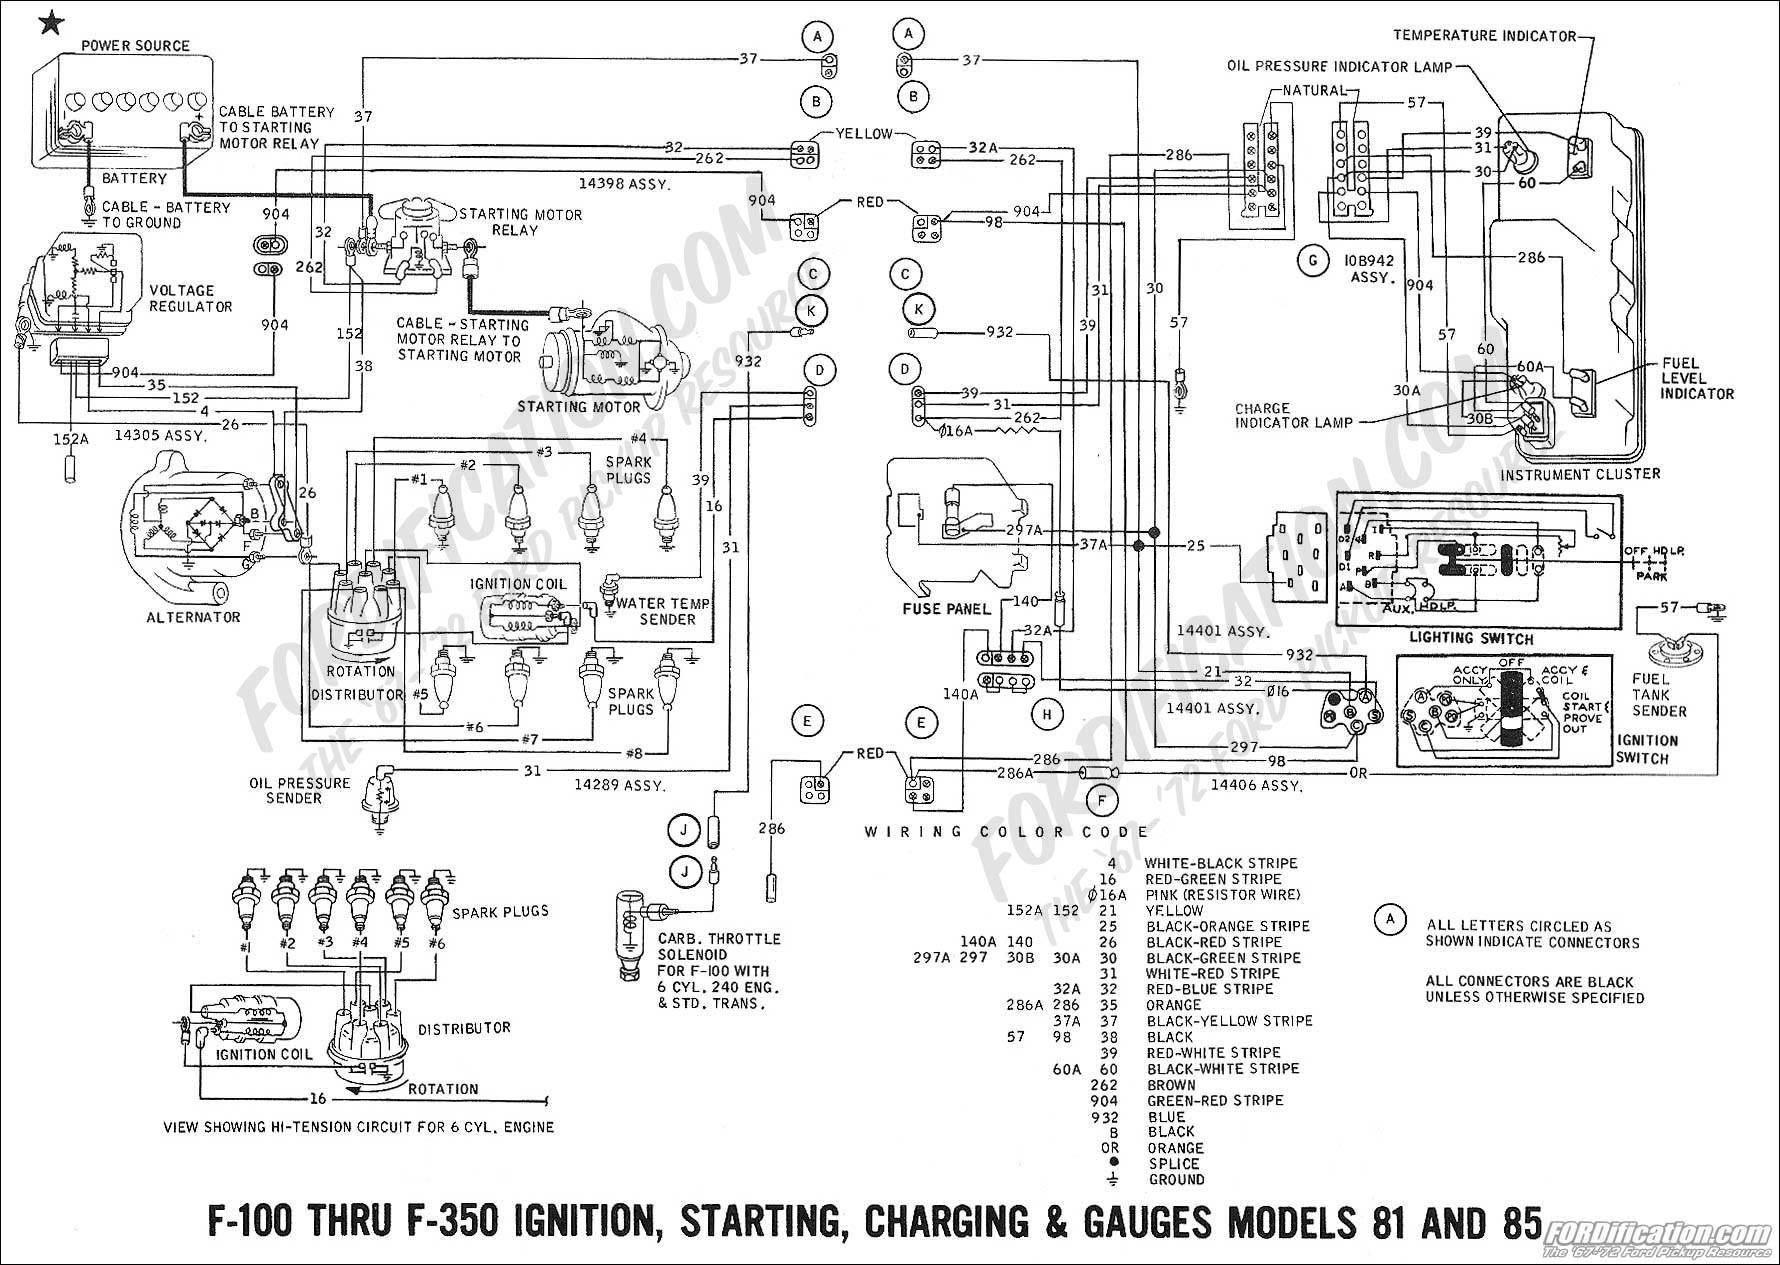 Wrg Ford Mustang V6 Fuse Box Diagram